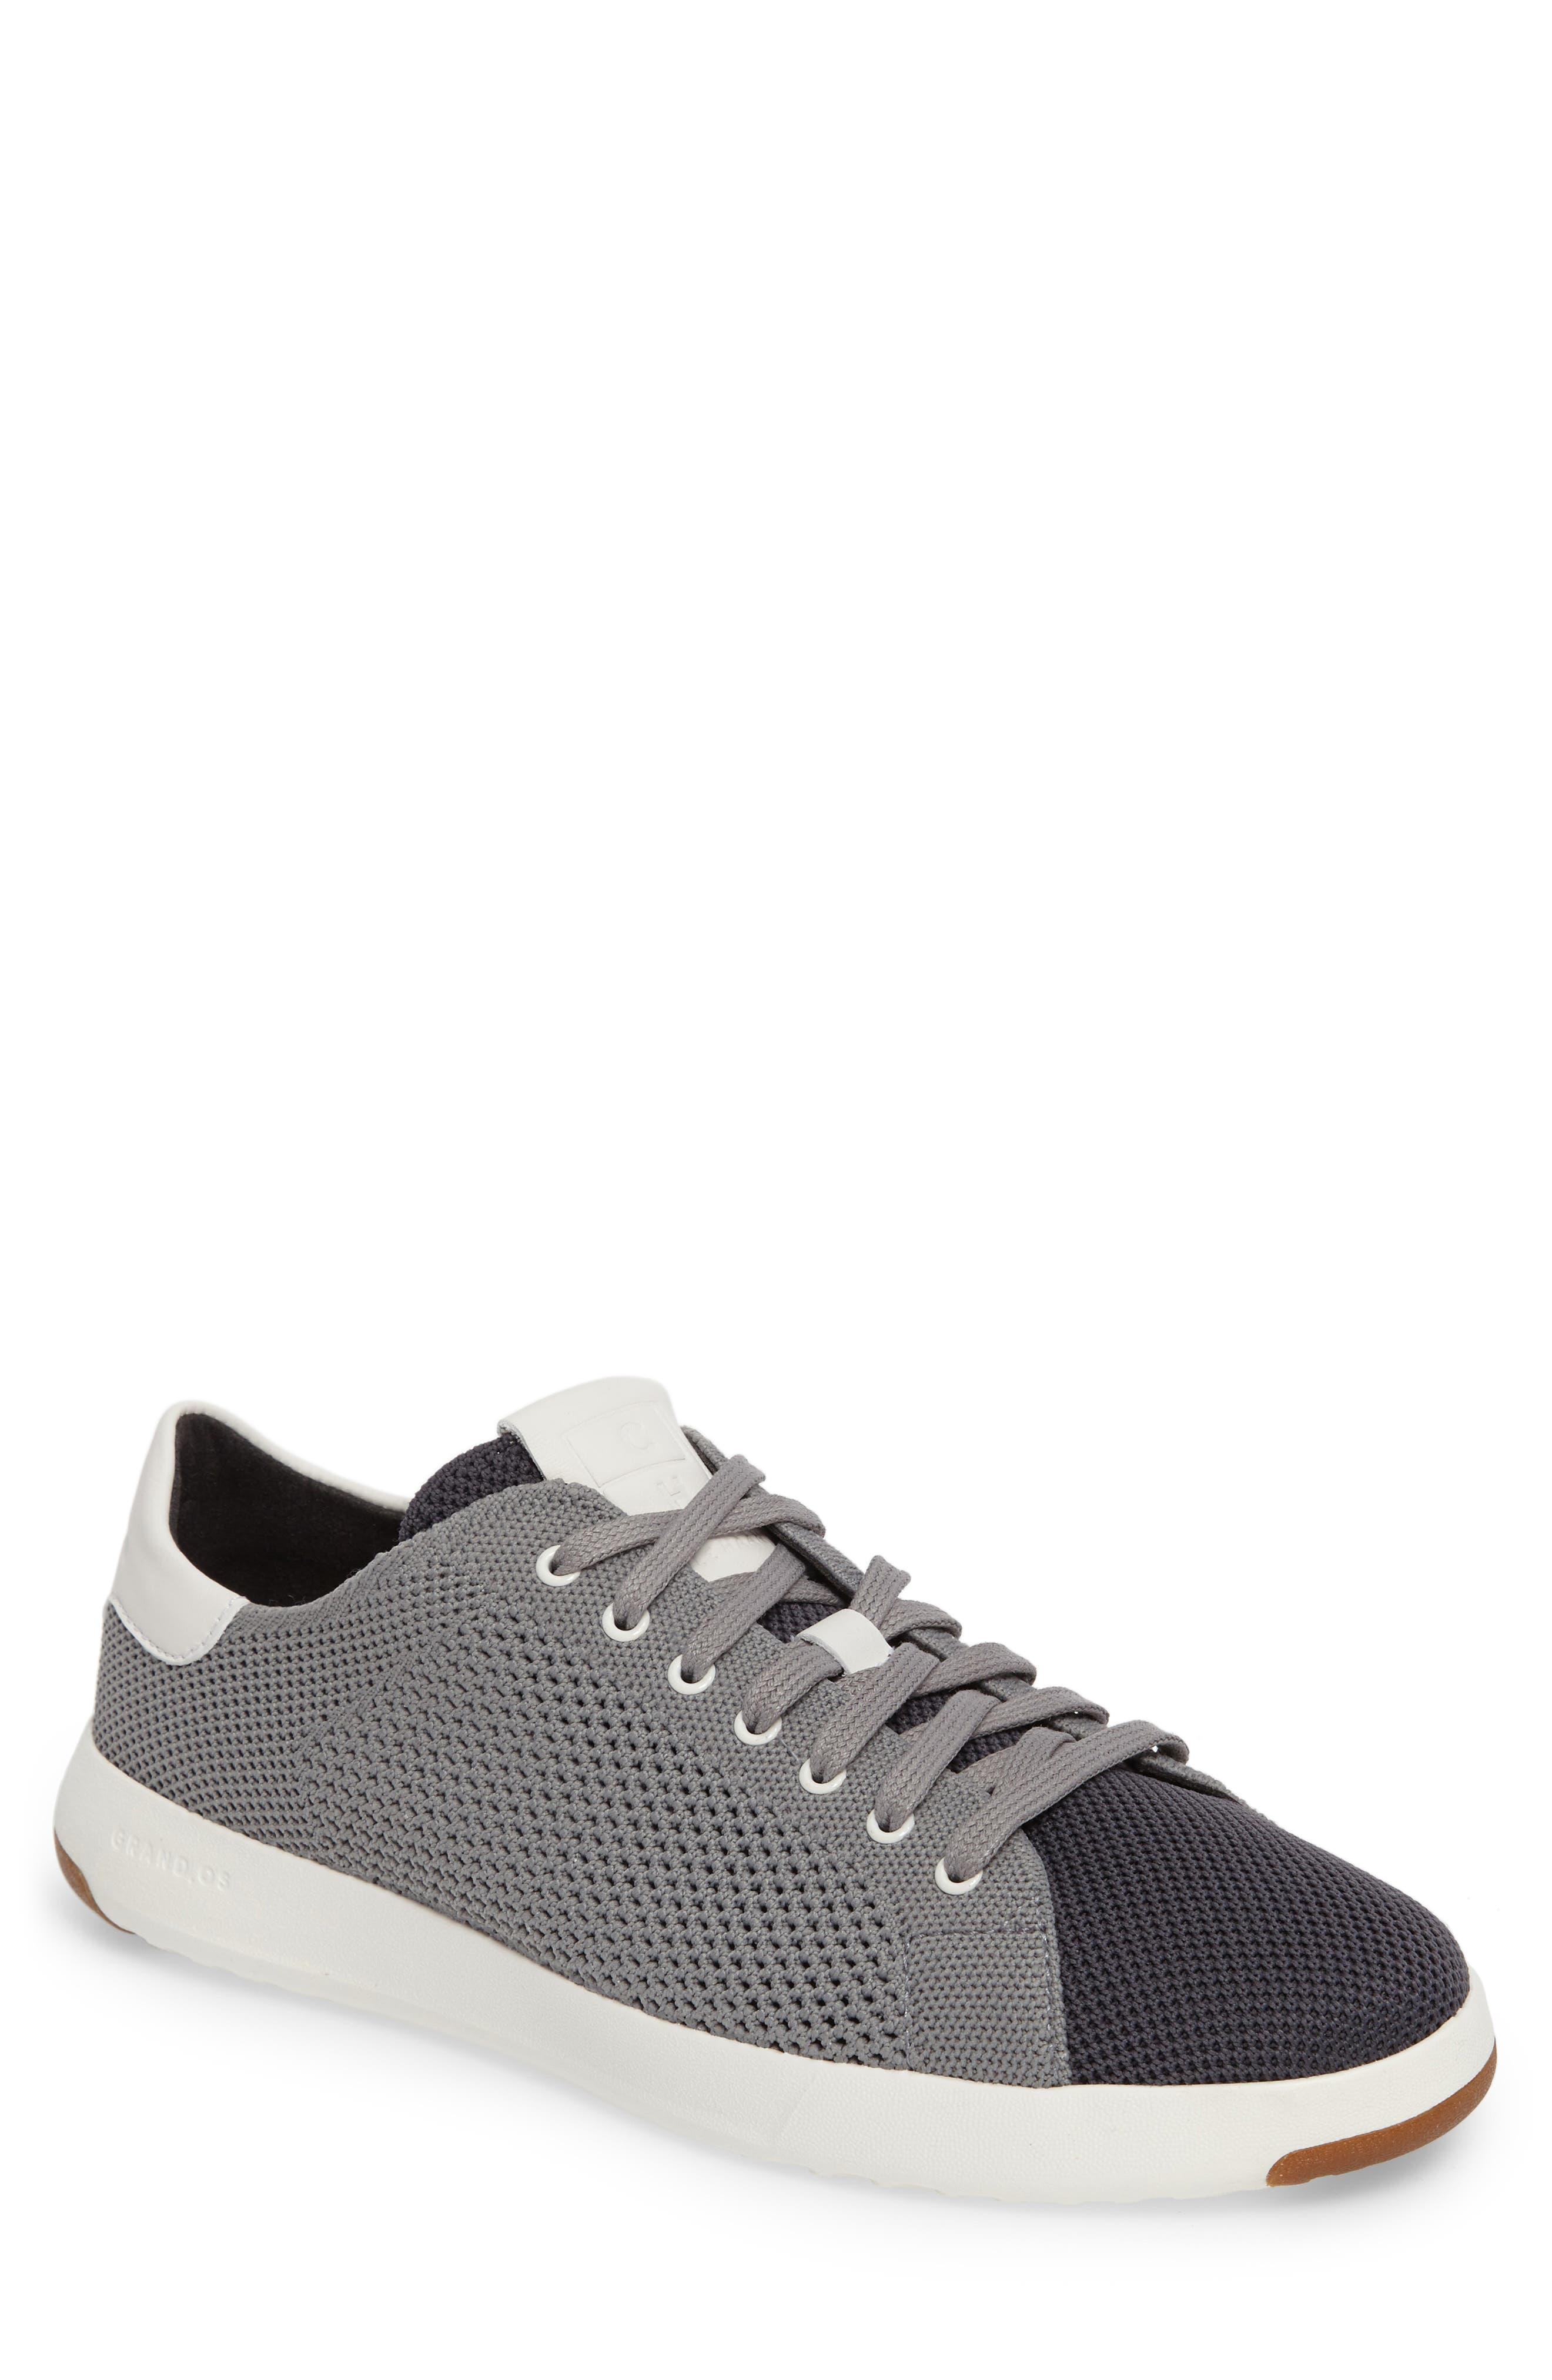 GrandPrø Stitchlite Tennis Sneaker,                         Main,                         color, Magnet Grey Fabric